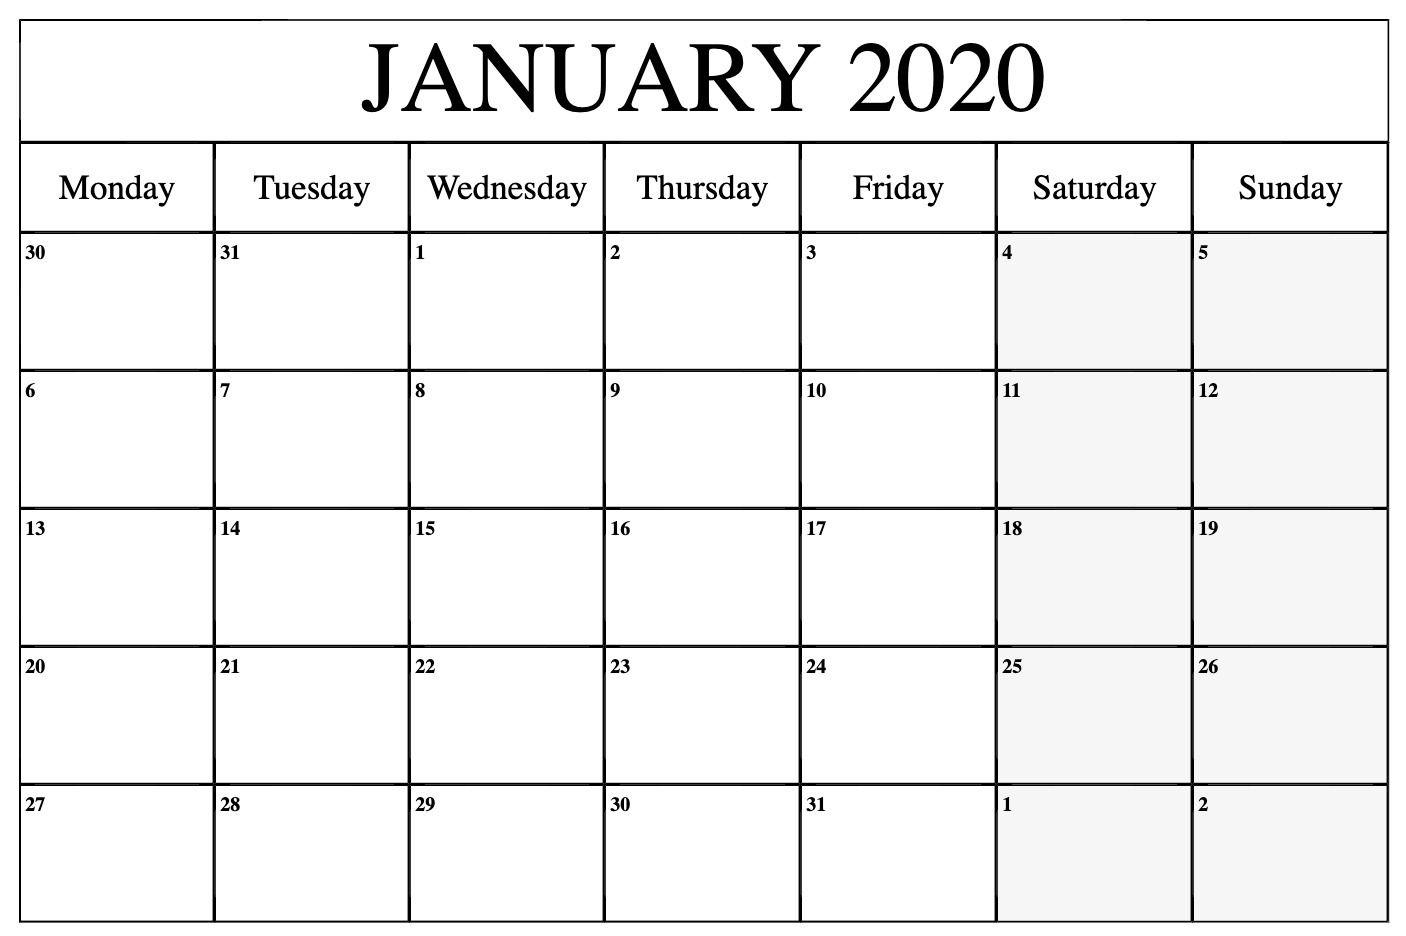 free january 2020 calendar printable template pdf, word, excel